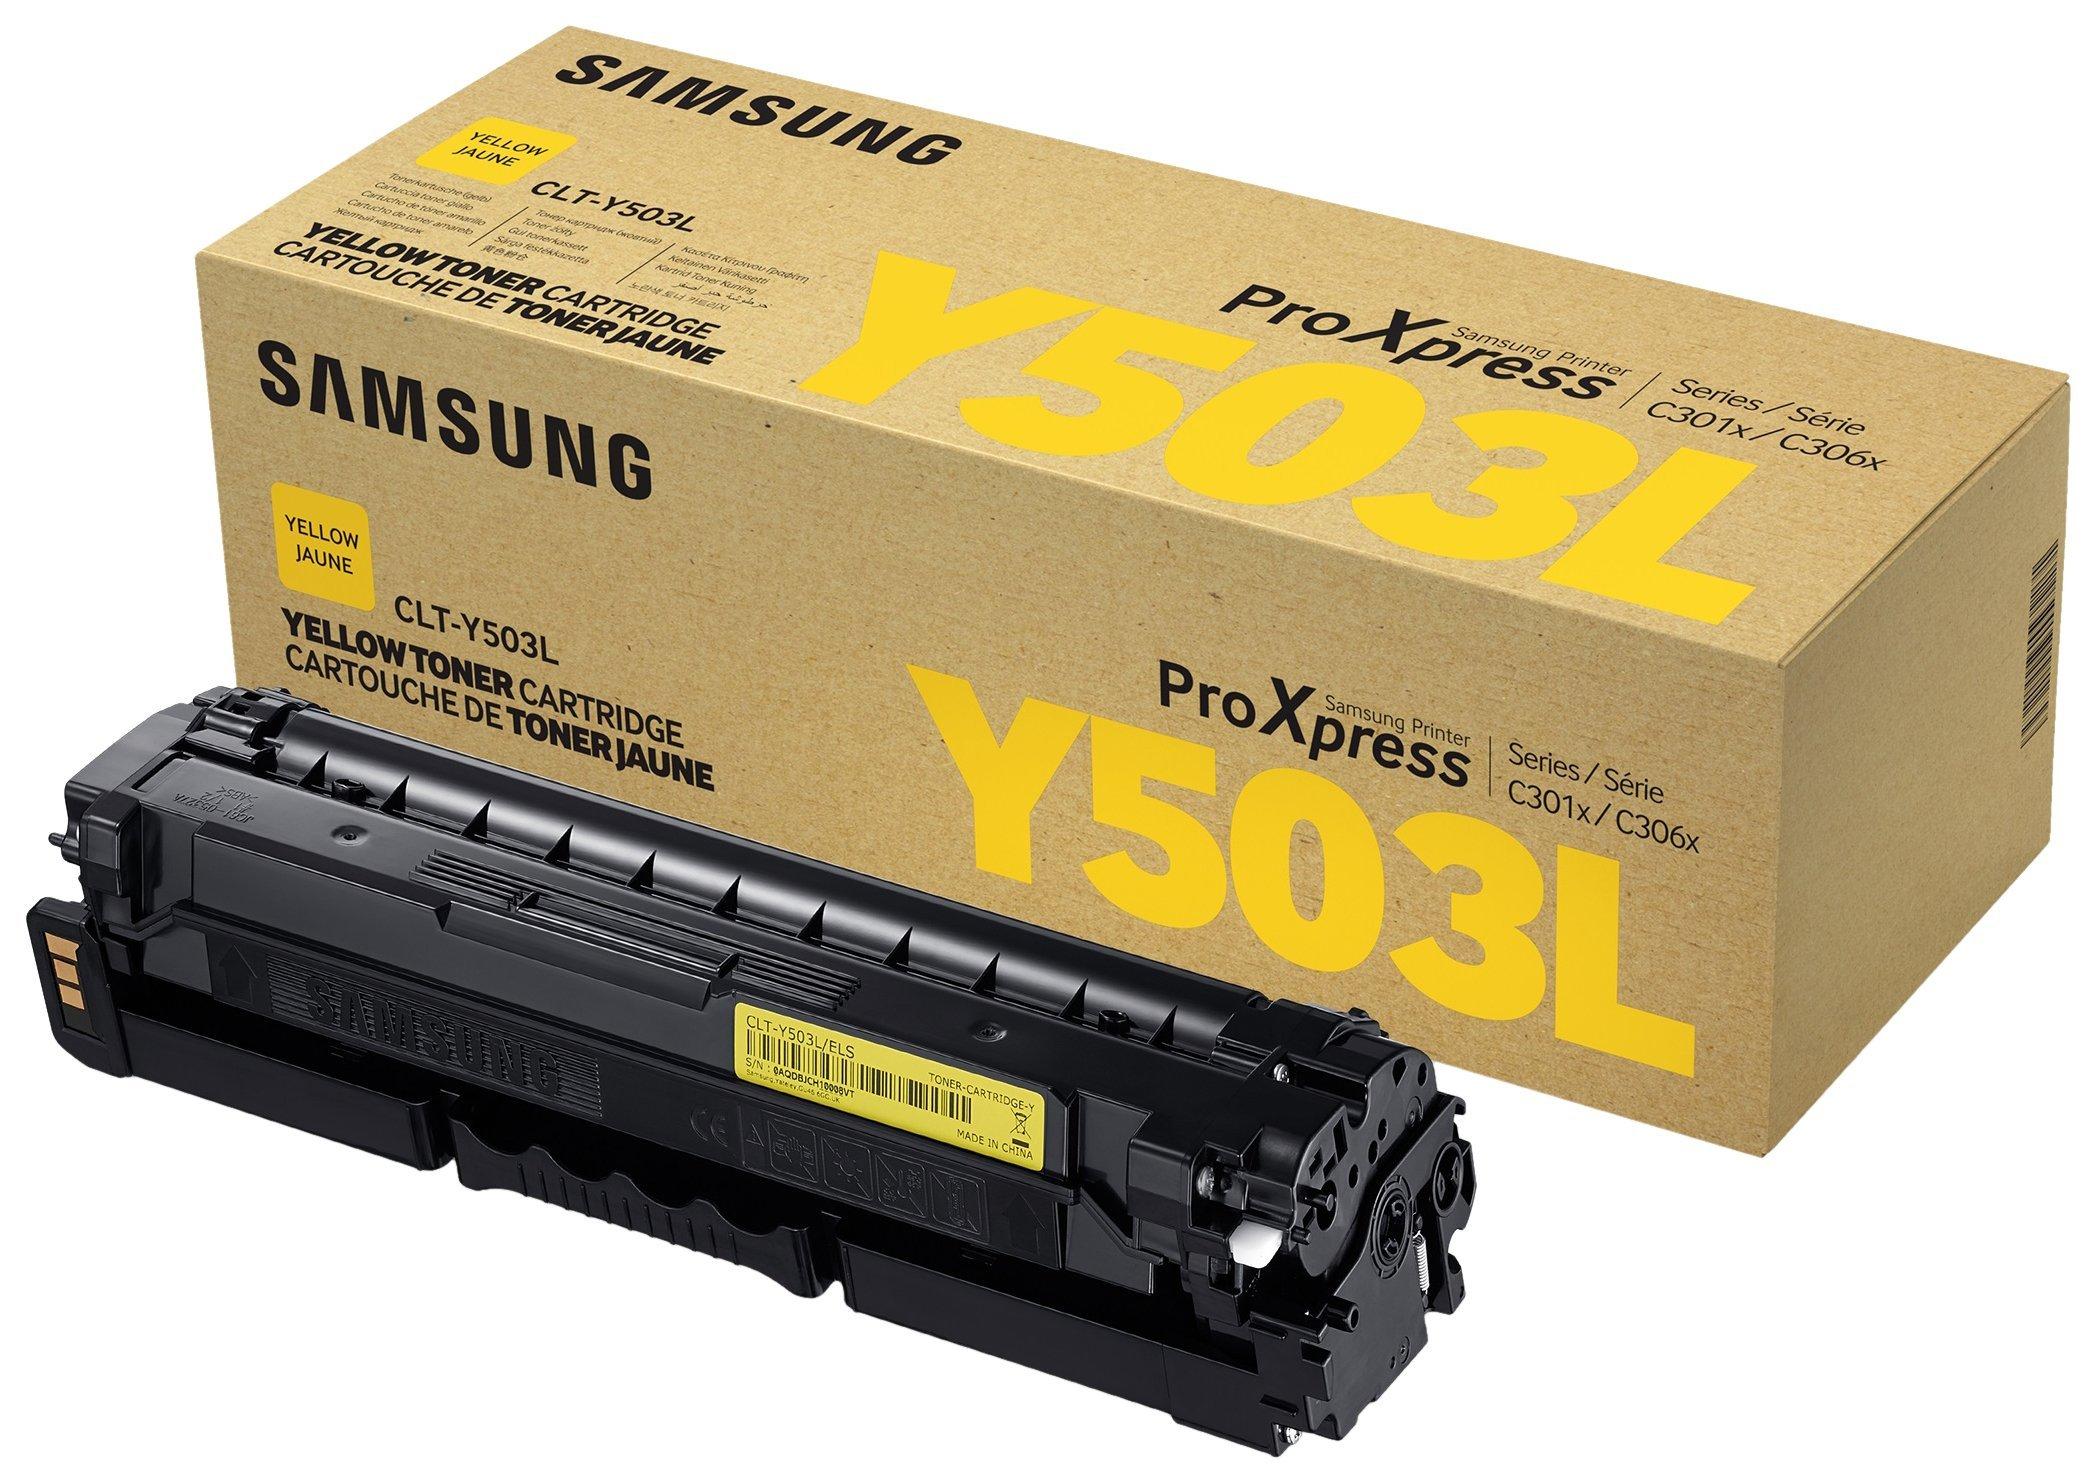 Samsung Electronics CLT-Y503L High-Yield Toner, Yellow (SU494A)